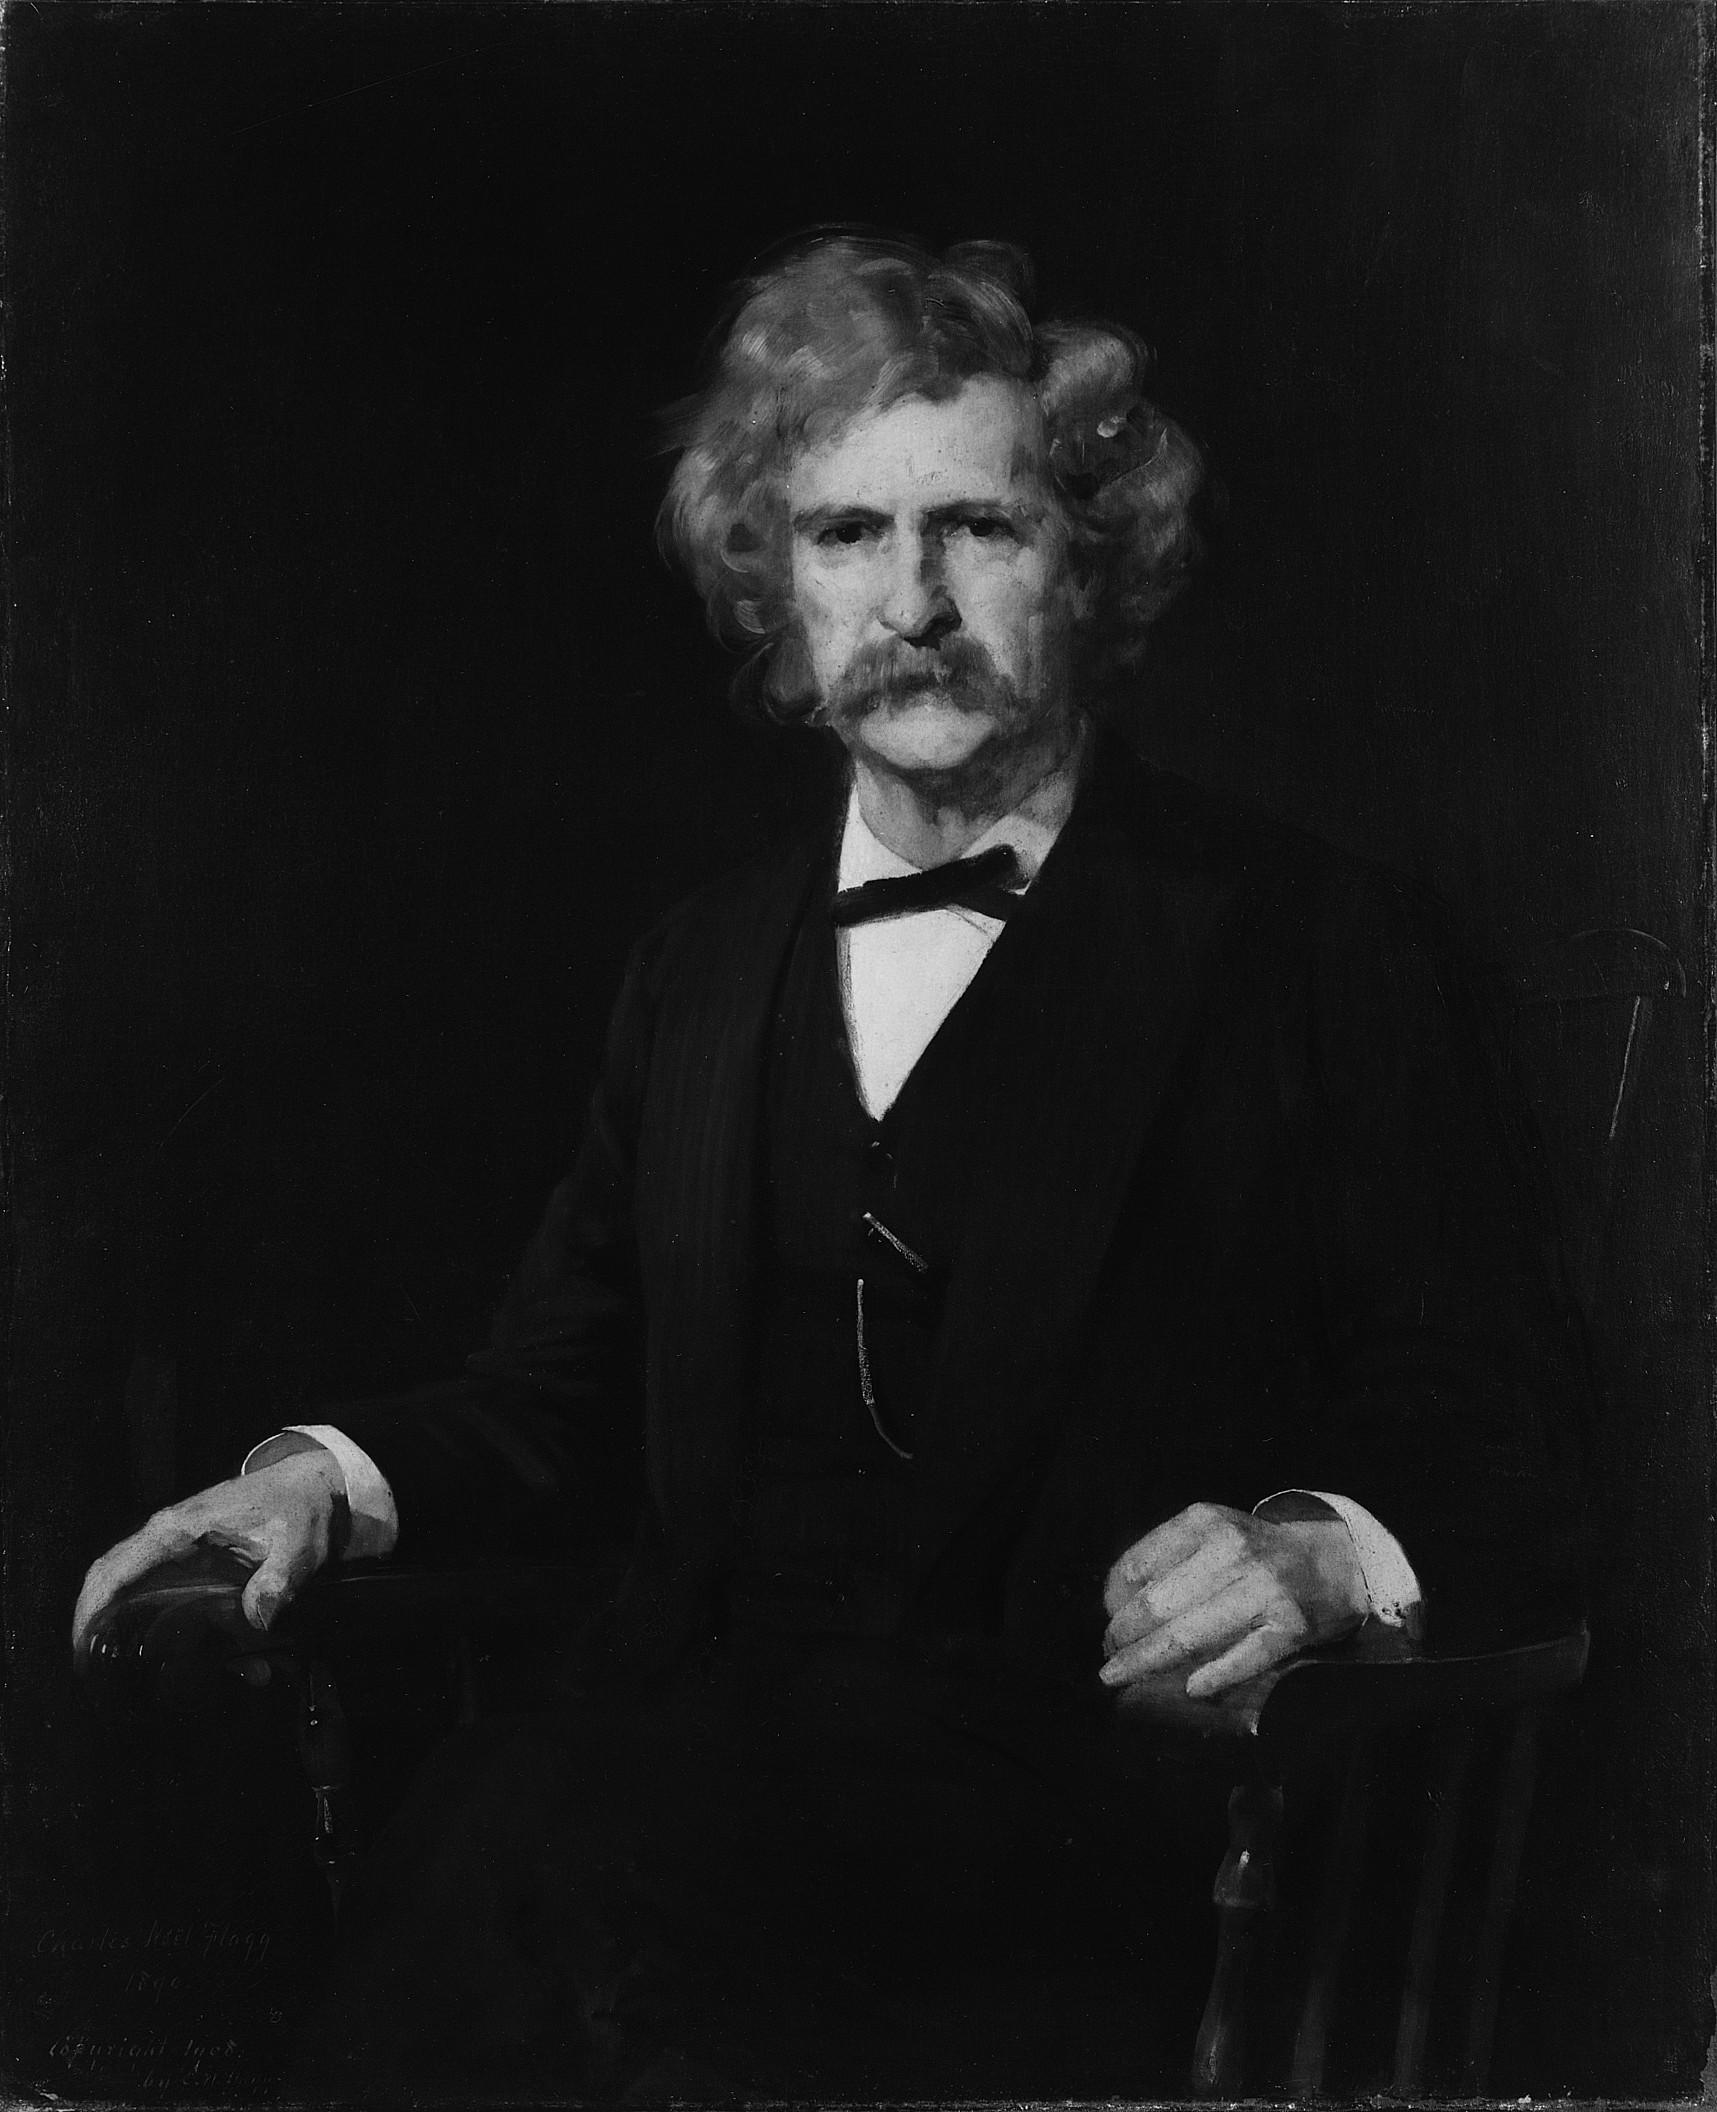 Mark Twain (Samuel Longhorn Clemmons)